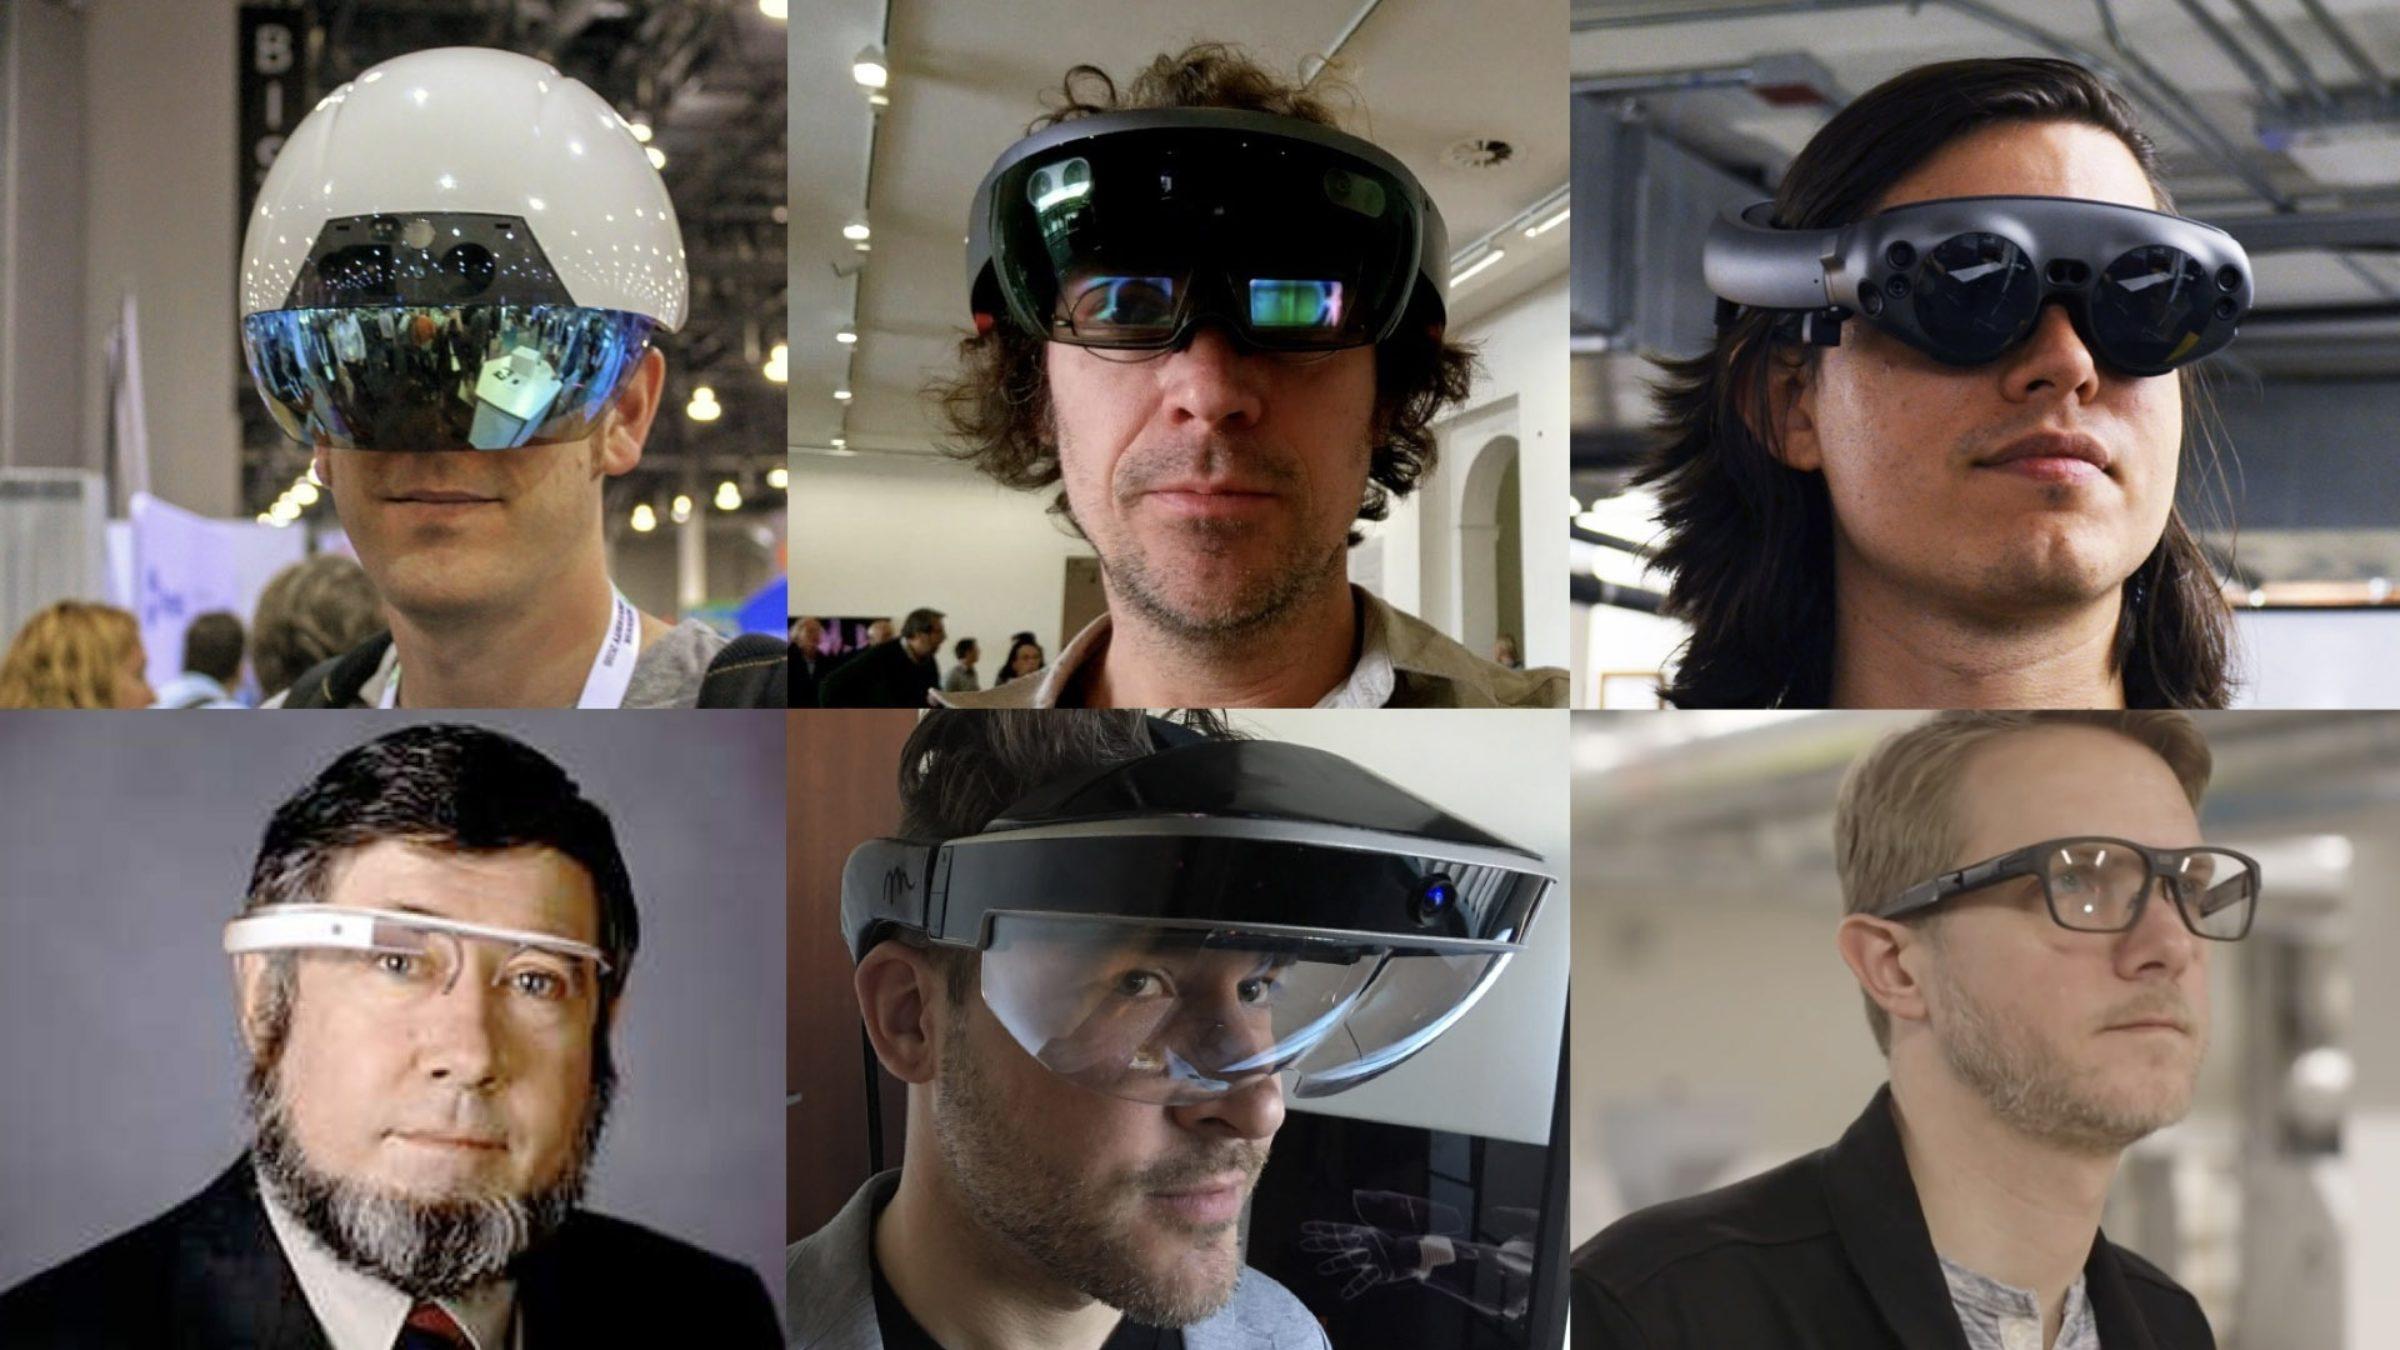 Sander Veenhof Augmented Reality Wearables